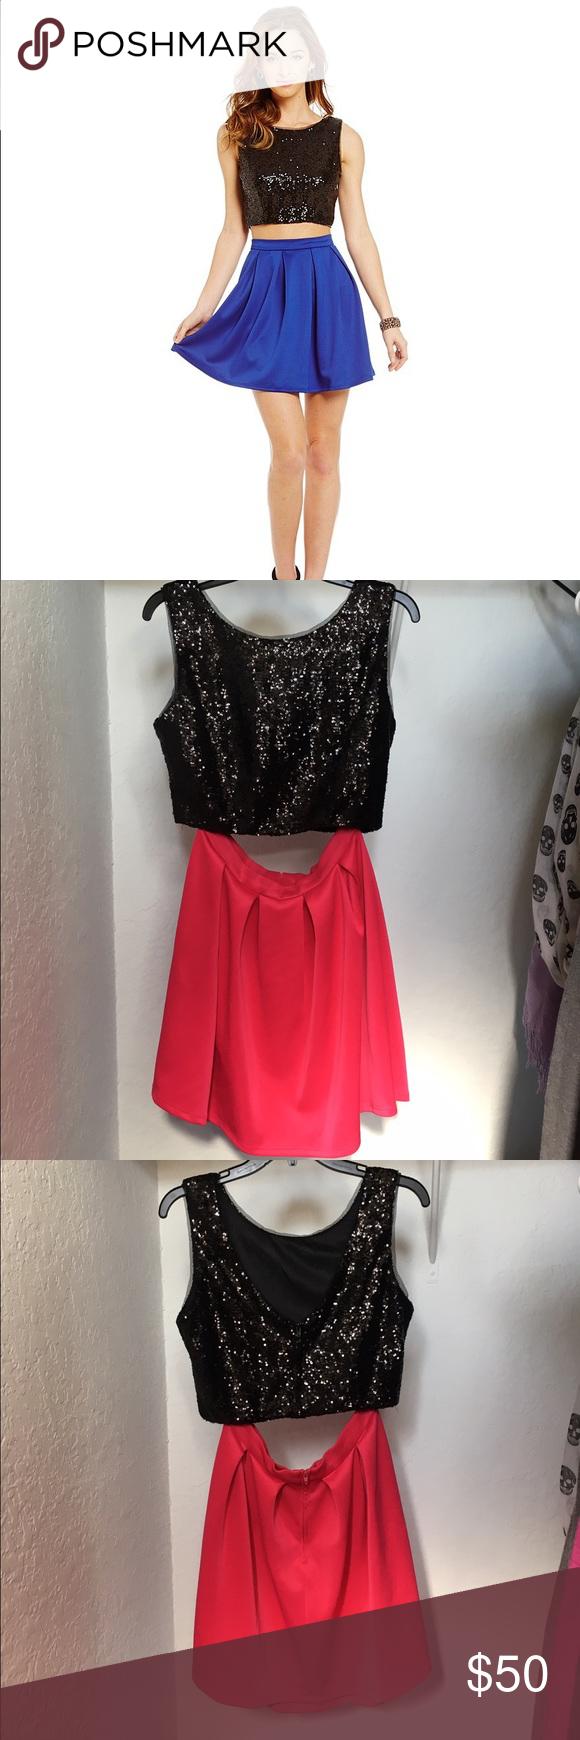 Black u pink two piece b darling dressfirm pink two piece